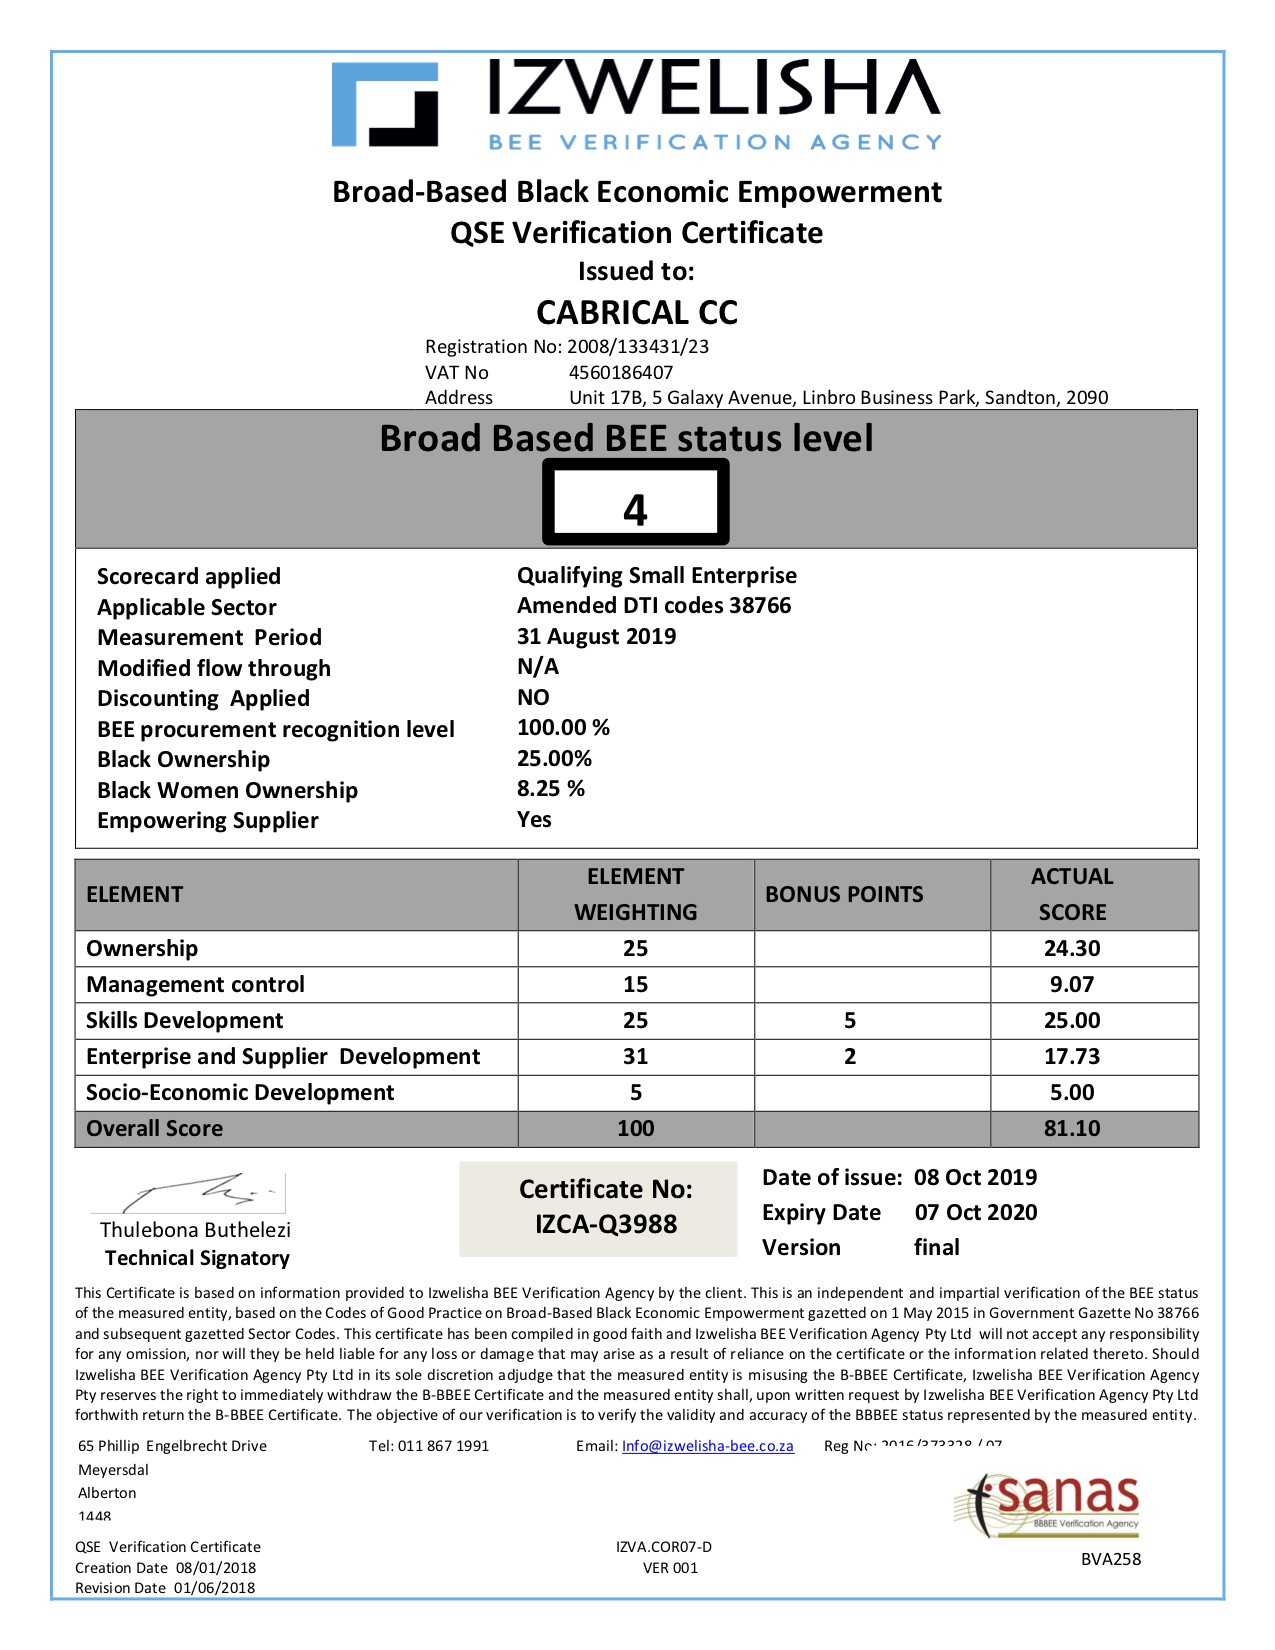 BEE Certificate - Cabrical cc (JPEG)